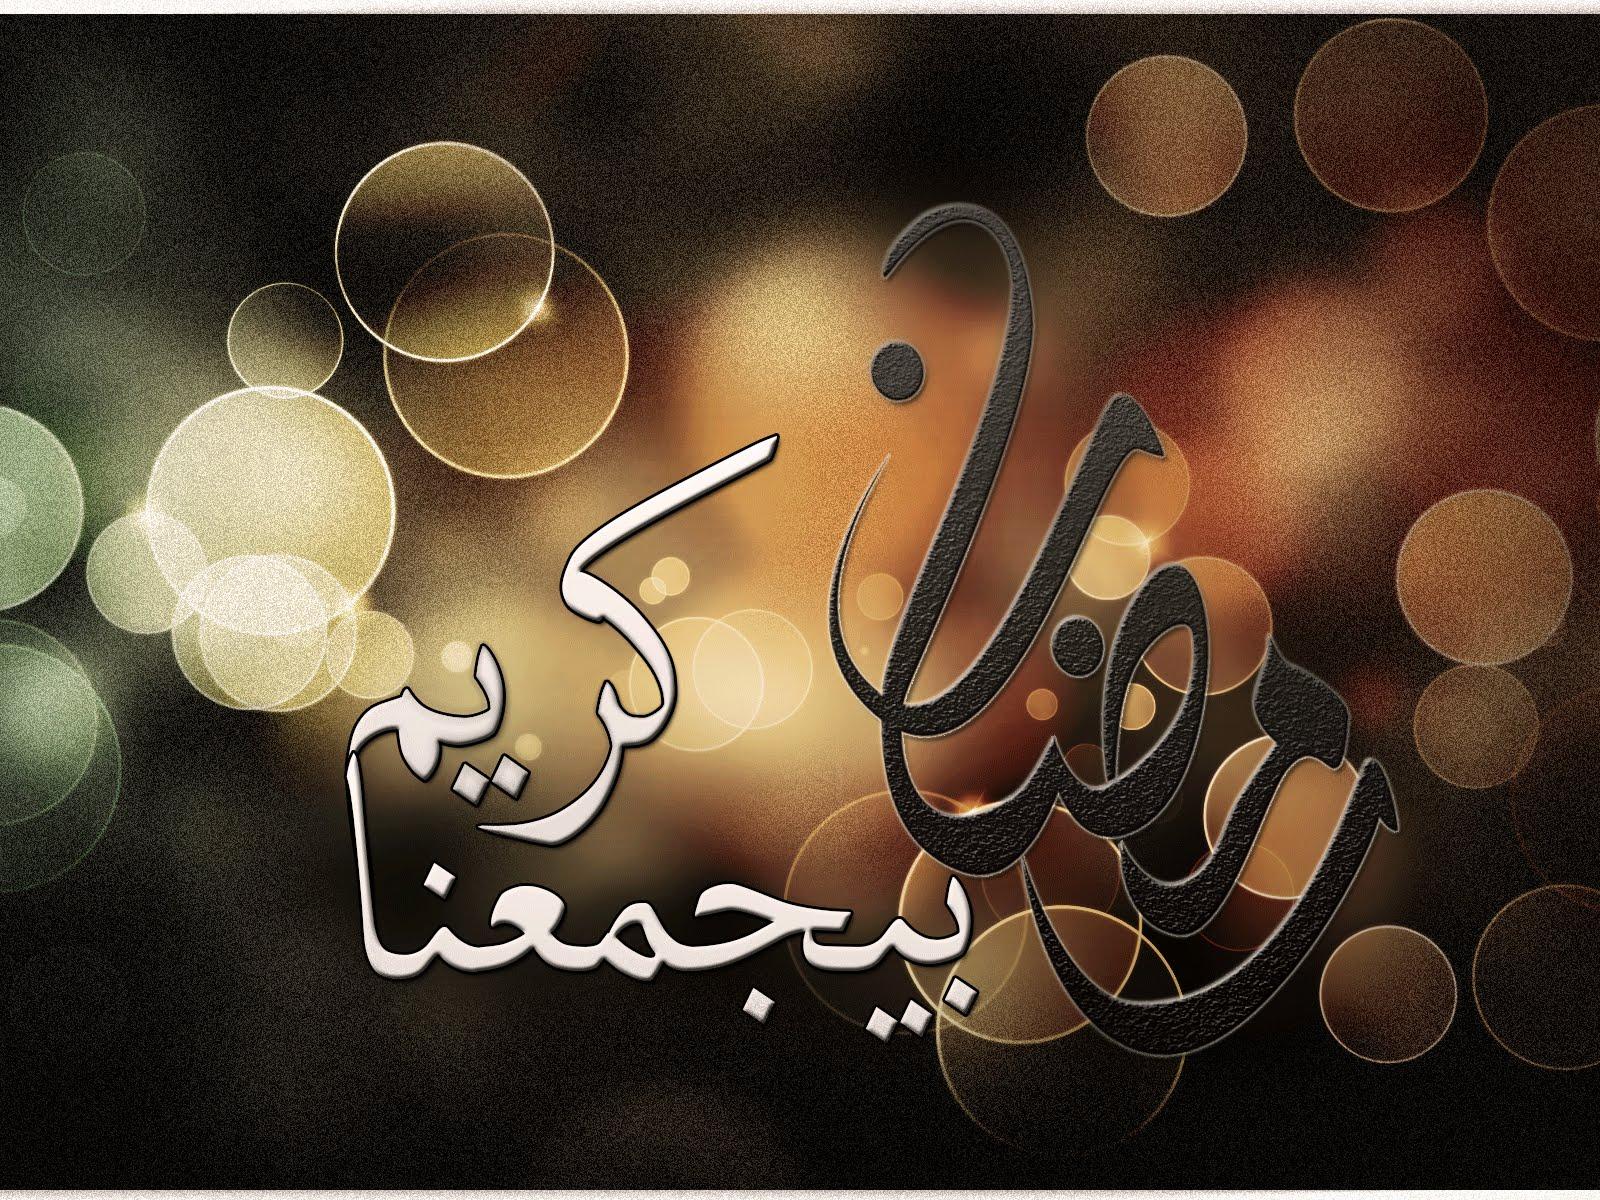 بالصور رسائل رمضان جديدة , تهنئات جديدة لرمضان 4323 10